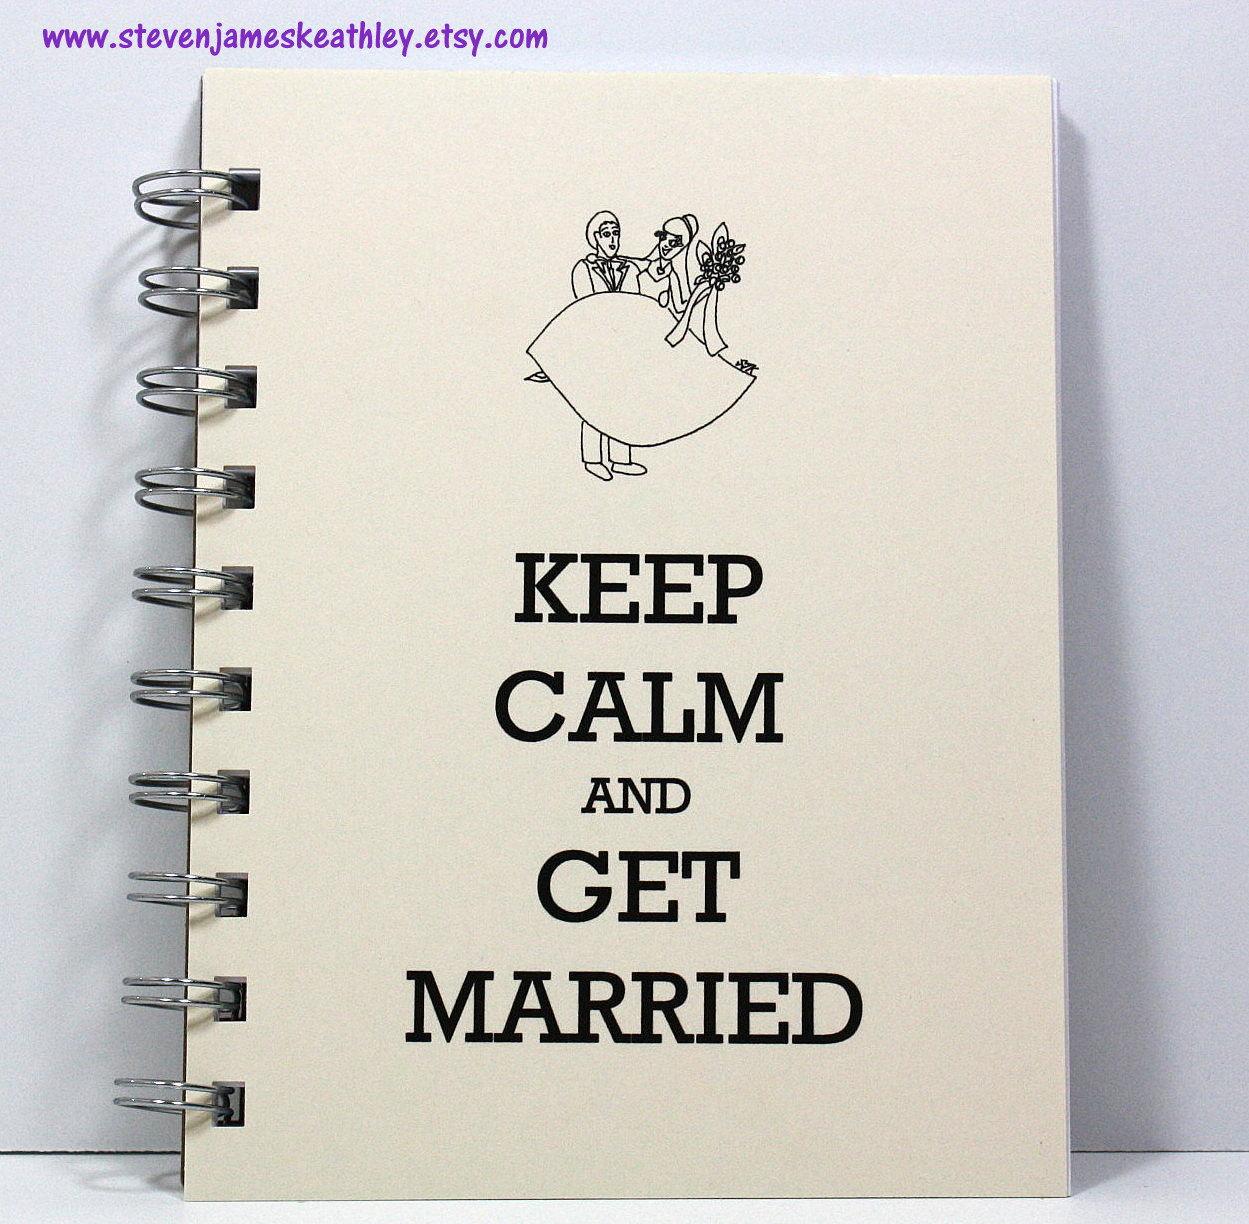 Wedding Planner Journal Notebook Guest Sign by stevenjameskeathley